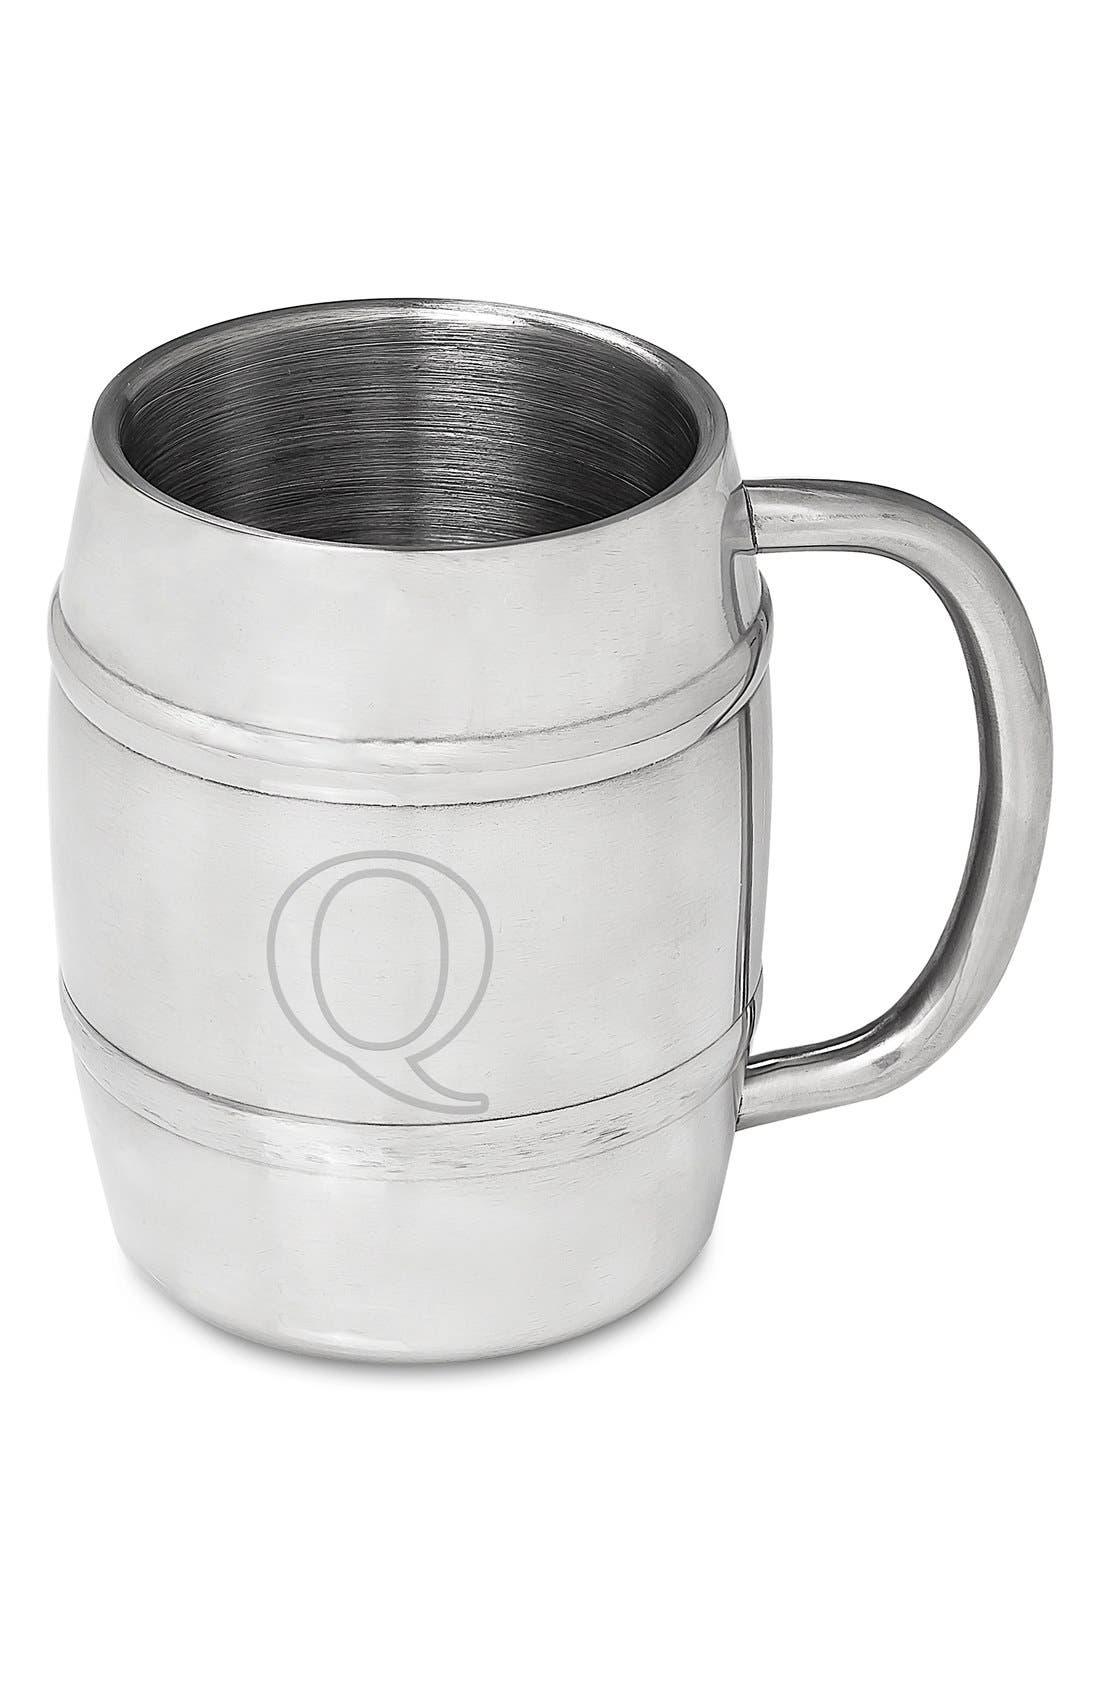 Monogram Stainless Steel Keg Mug,                             Main thumbnail 19, color,